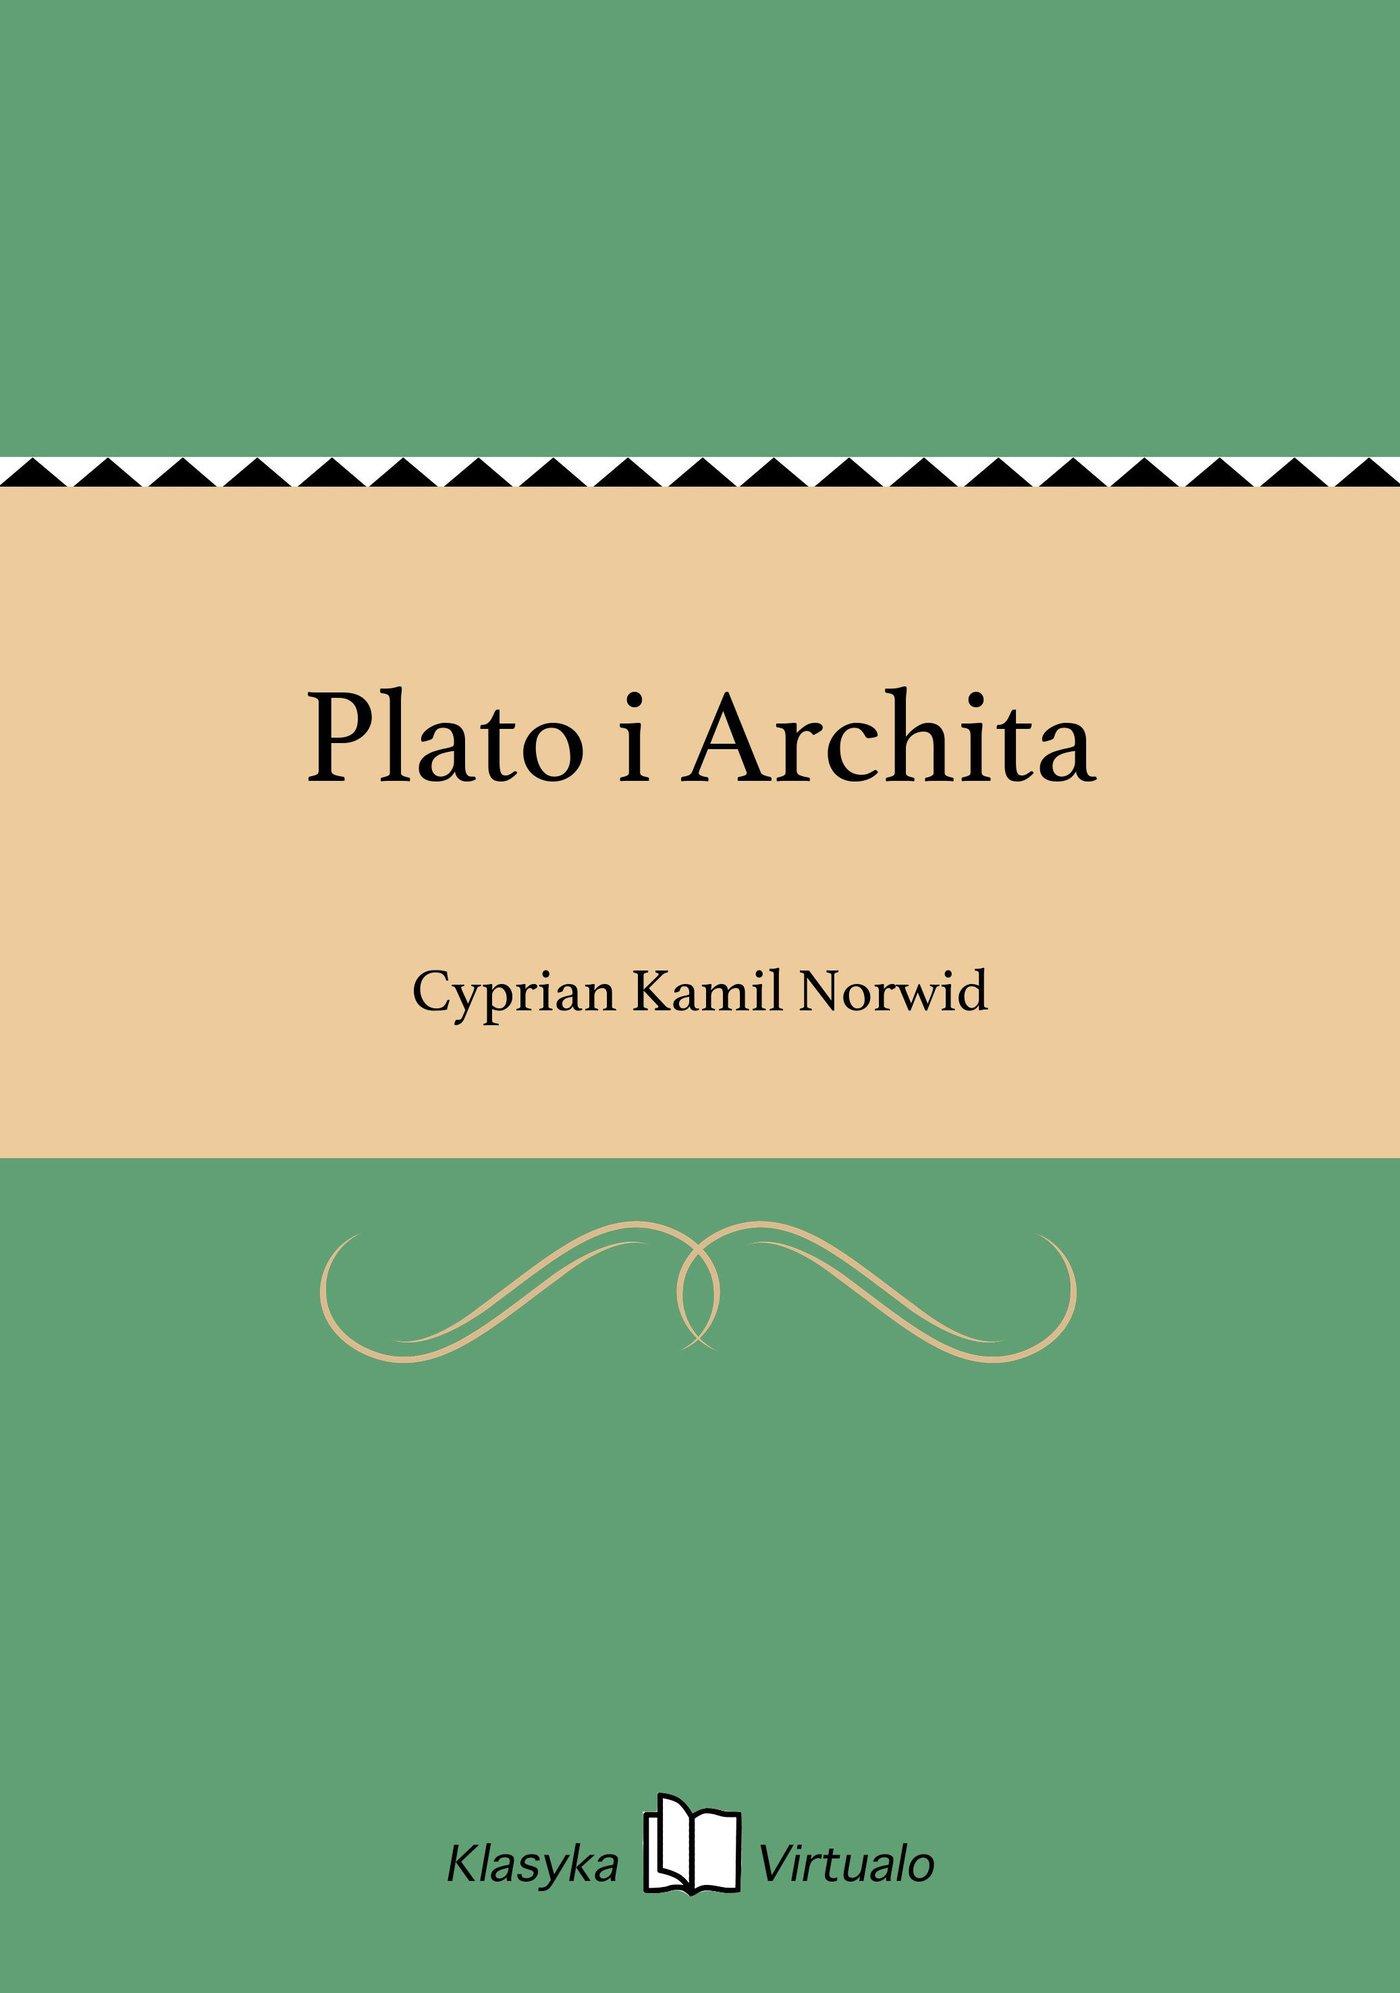 Plato i Archita - Ebook (Książka EPUB) do pobrania w formacie EPUB